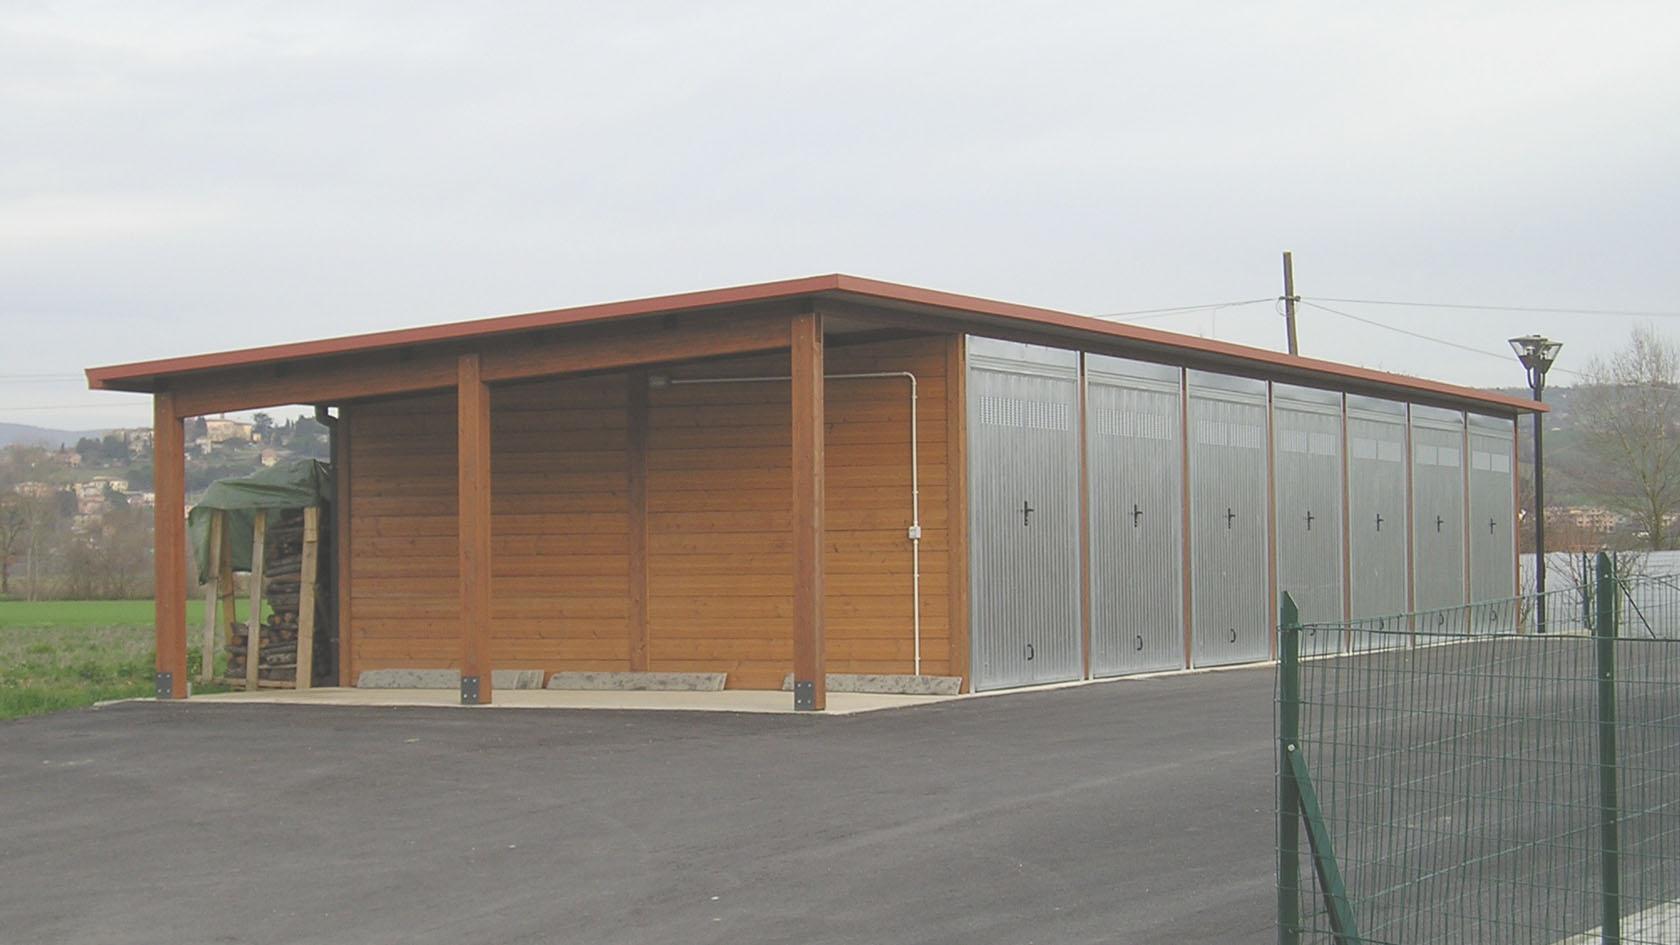 strutture prefabbricate in legno tettoie prefabbricate